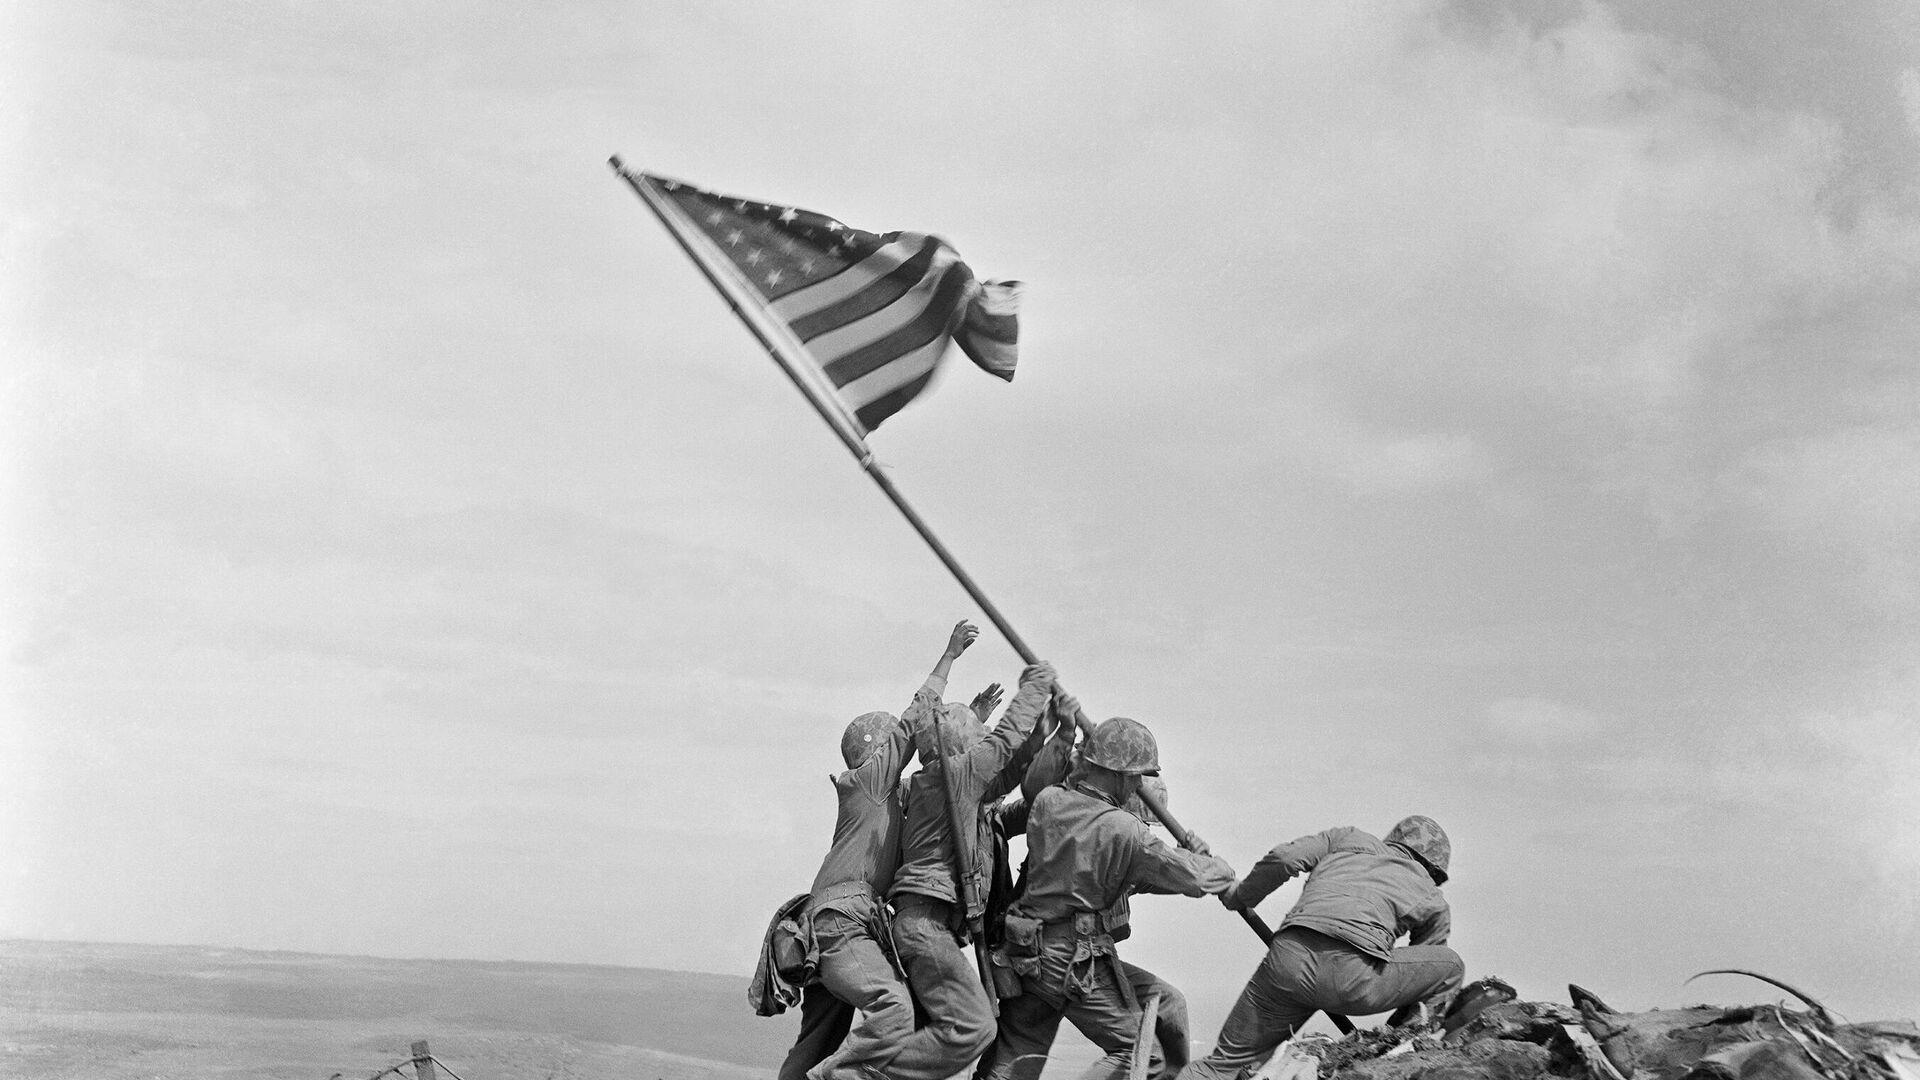 Izado de la bandera de Estados Unidos en Iwo Jima - Sputnik Mundo, 1920, 26.08.2021